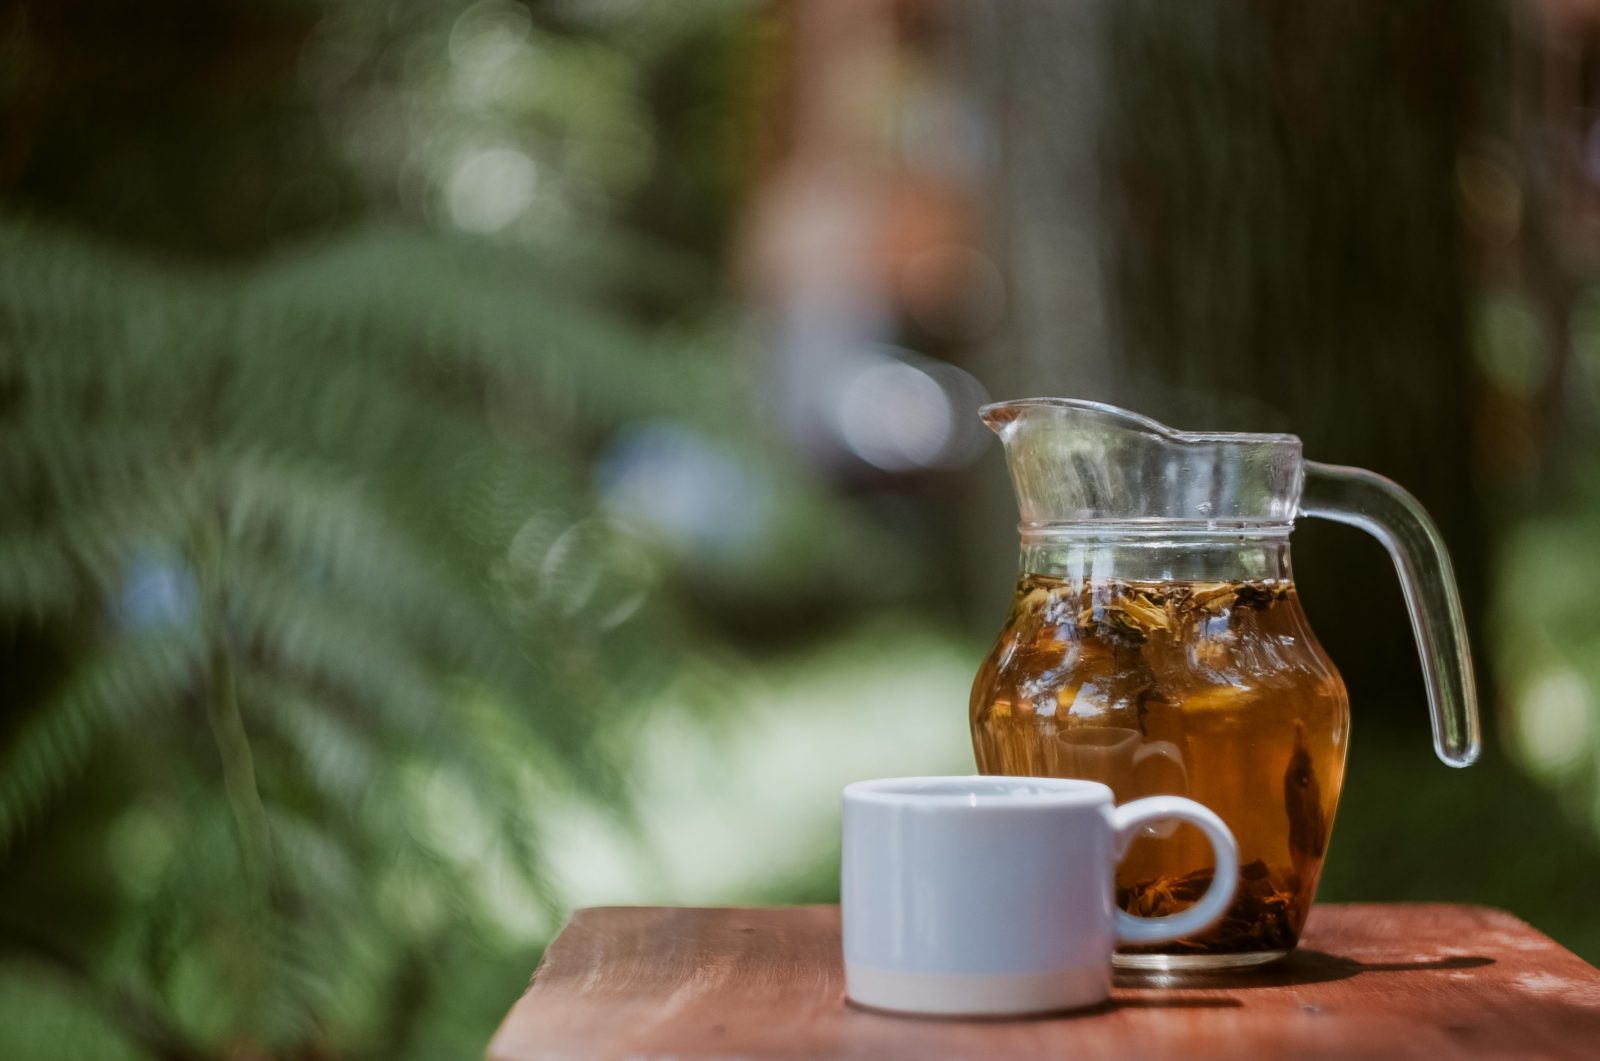 A pitcher of iced tea